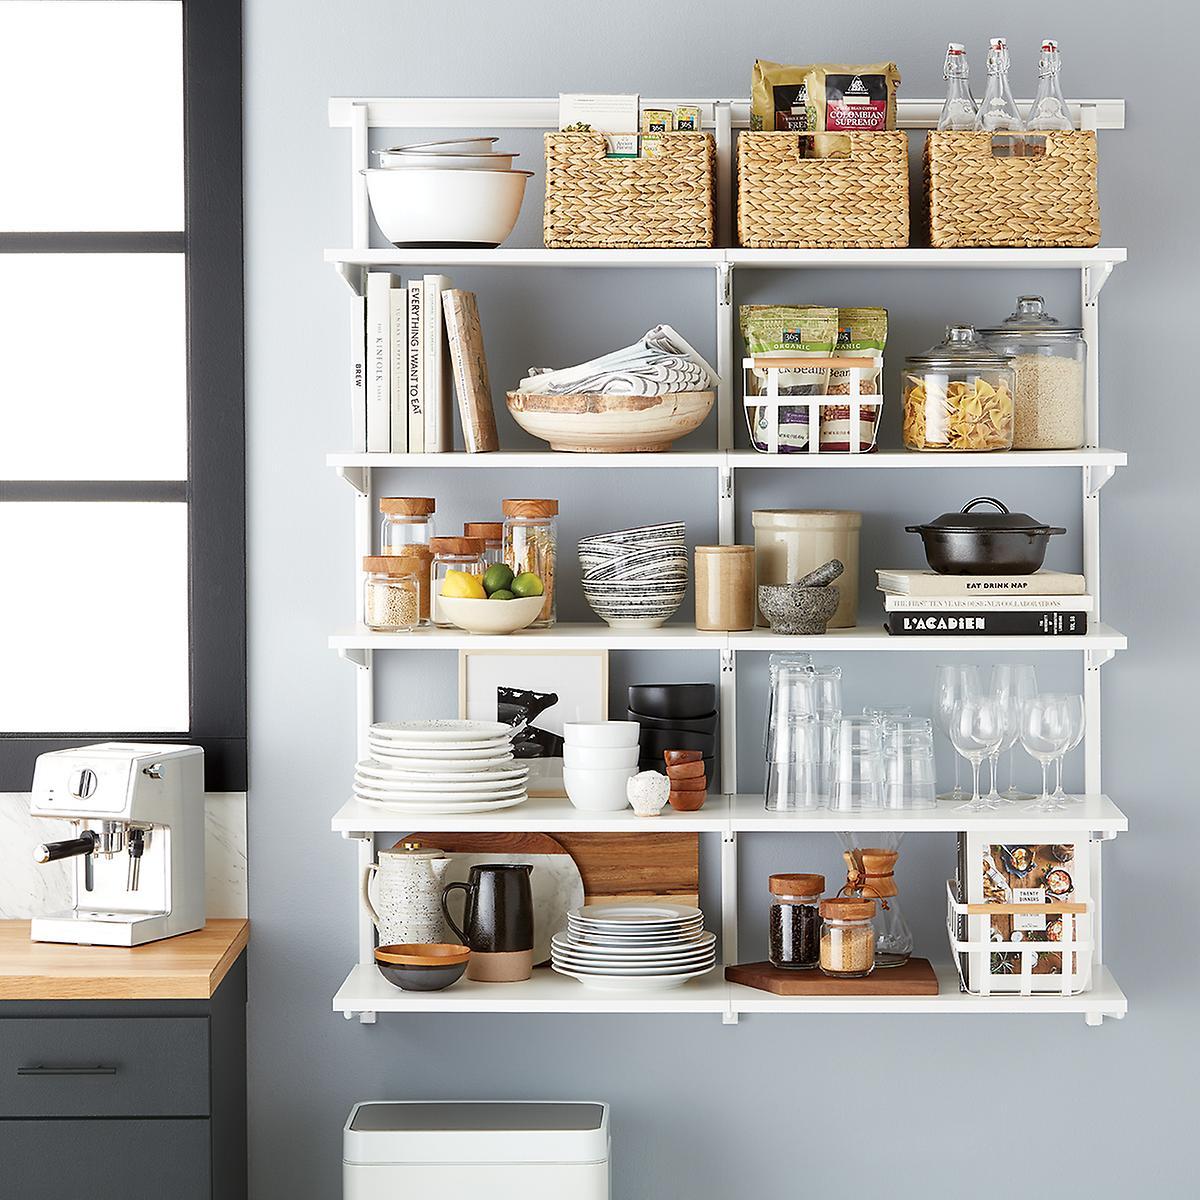 Elfa Classic 4\' Open Kitchen Shelving